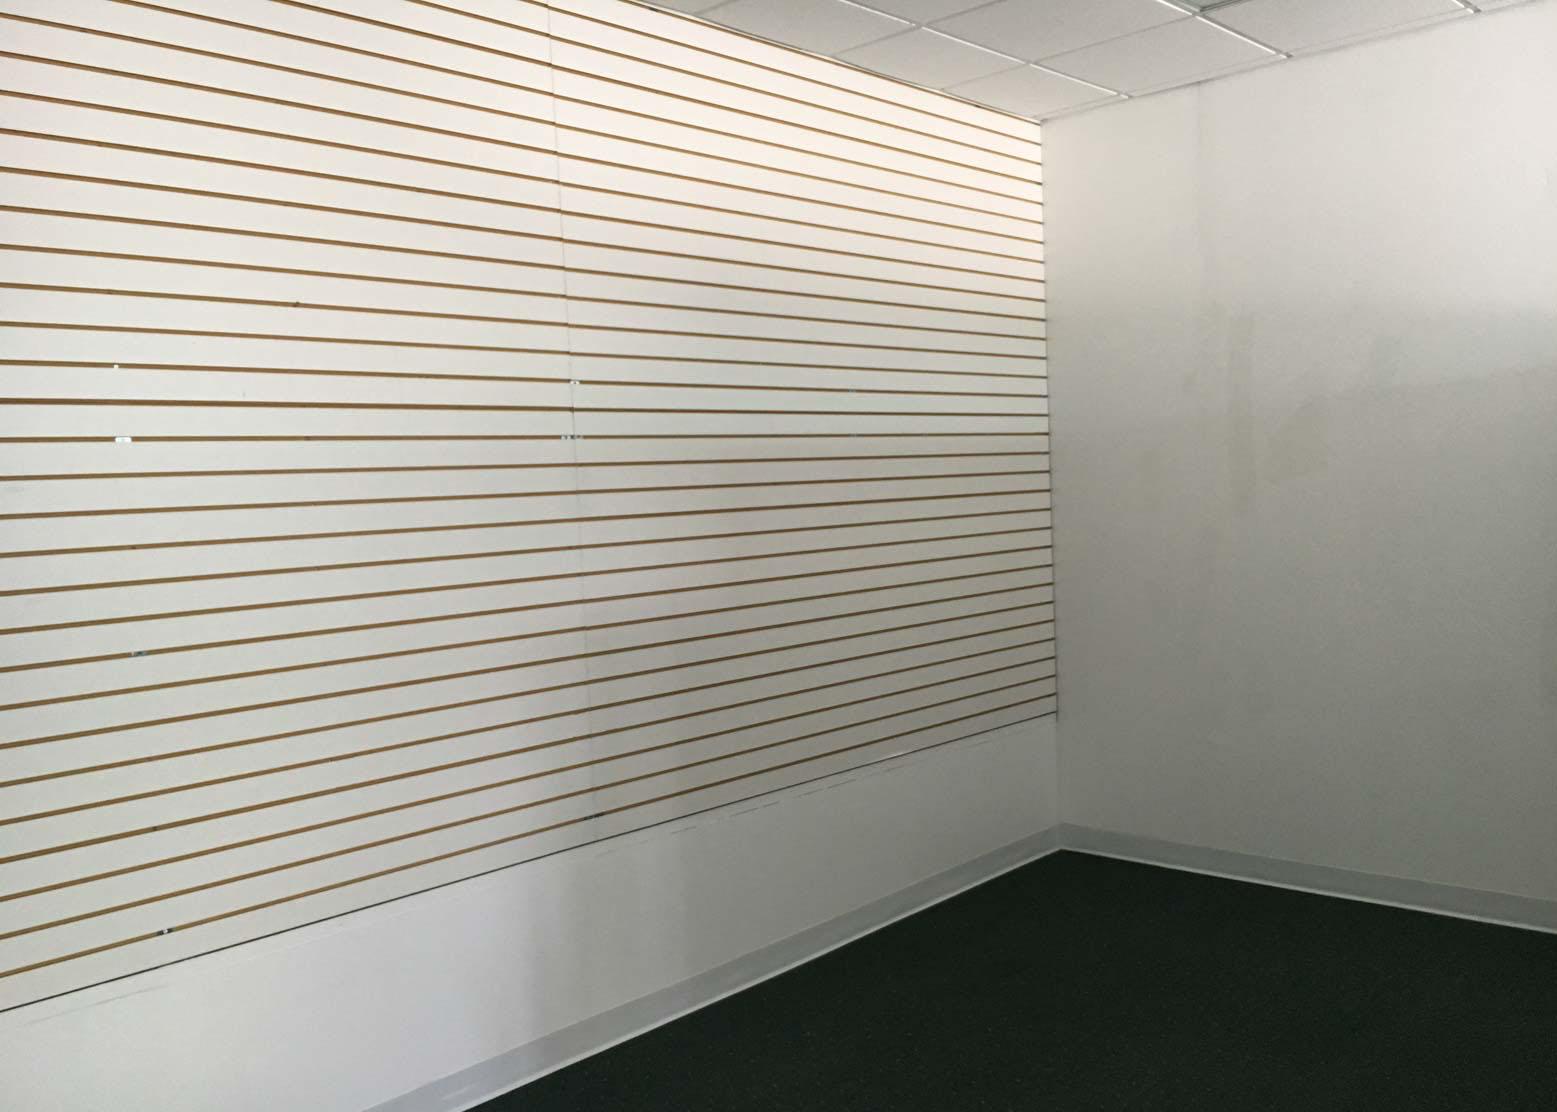 Before renovation of photography studio